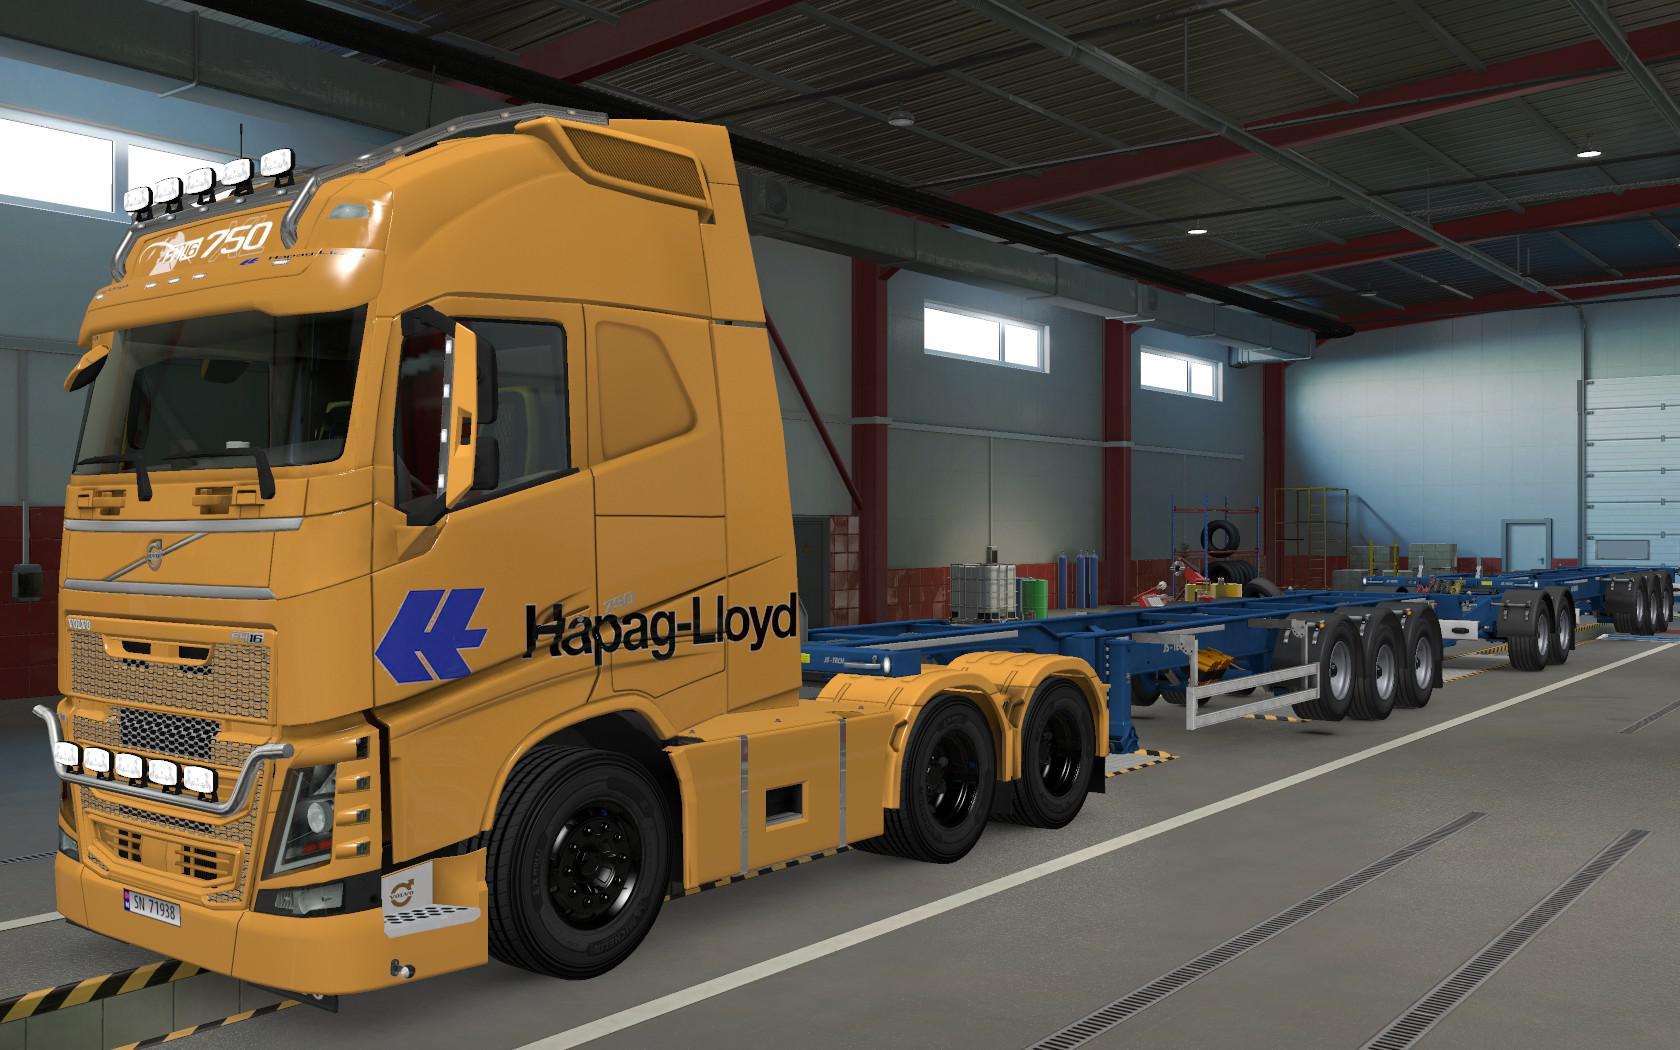 ETS2 - Volvo FH16 2012 Hapag LLoyd Orange Skin (1.37.x)